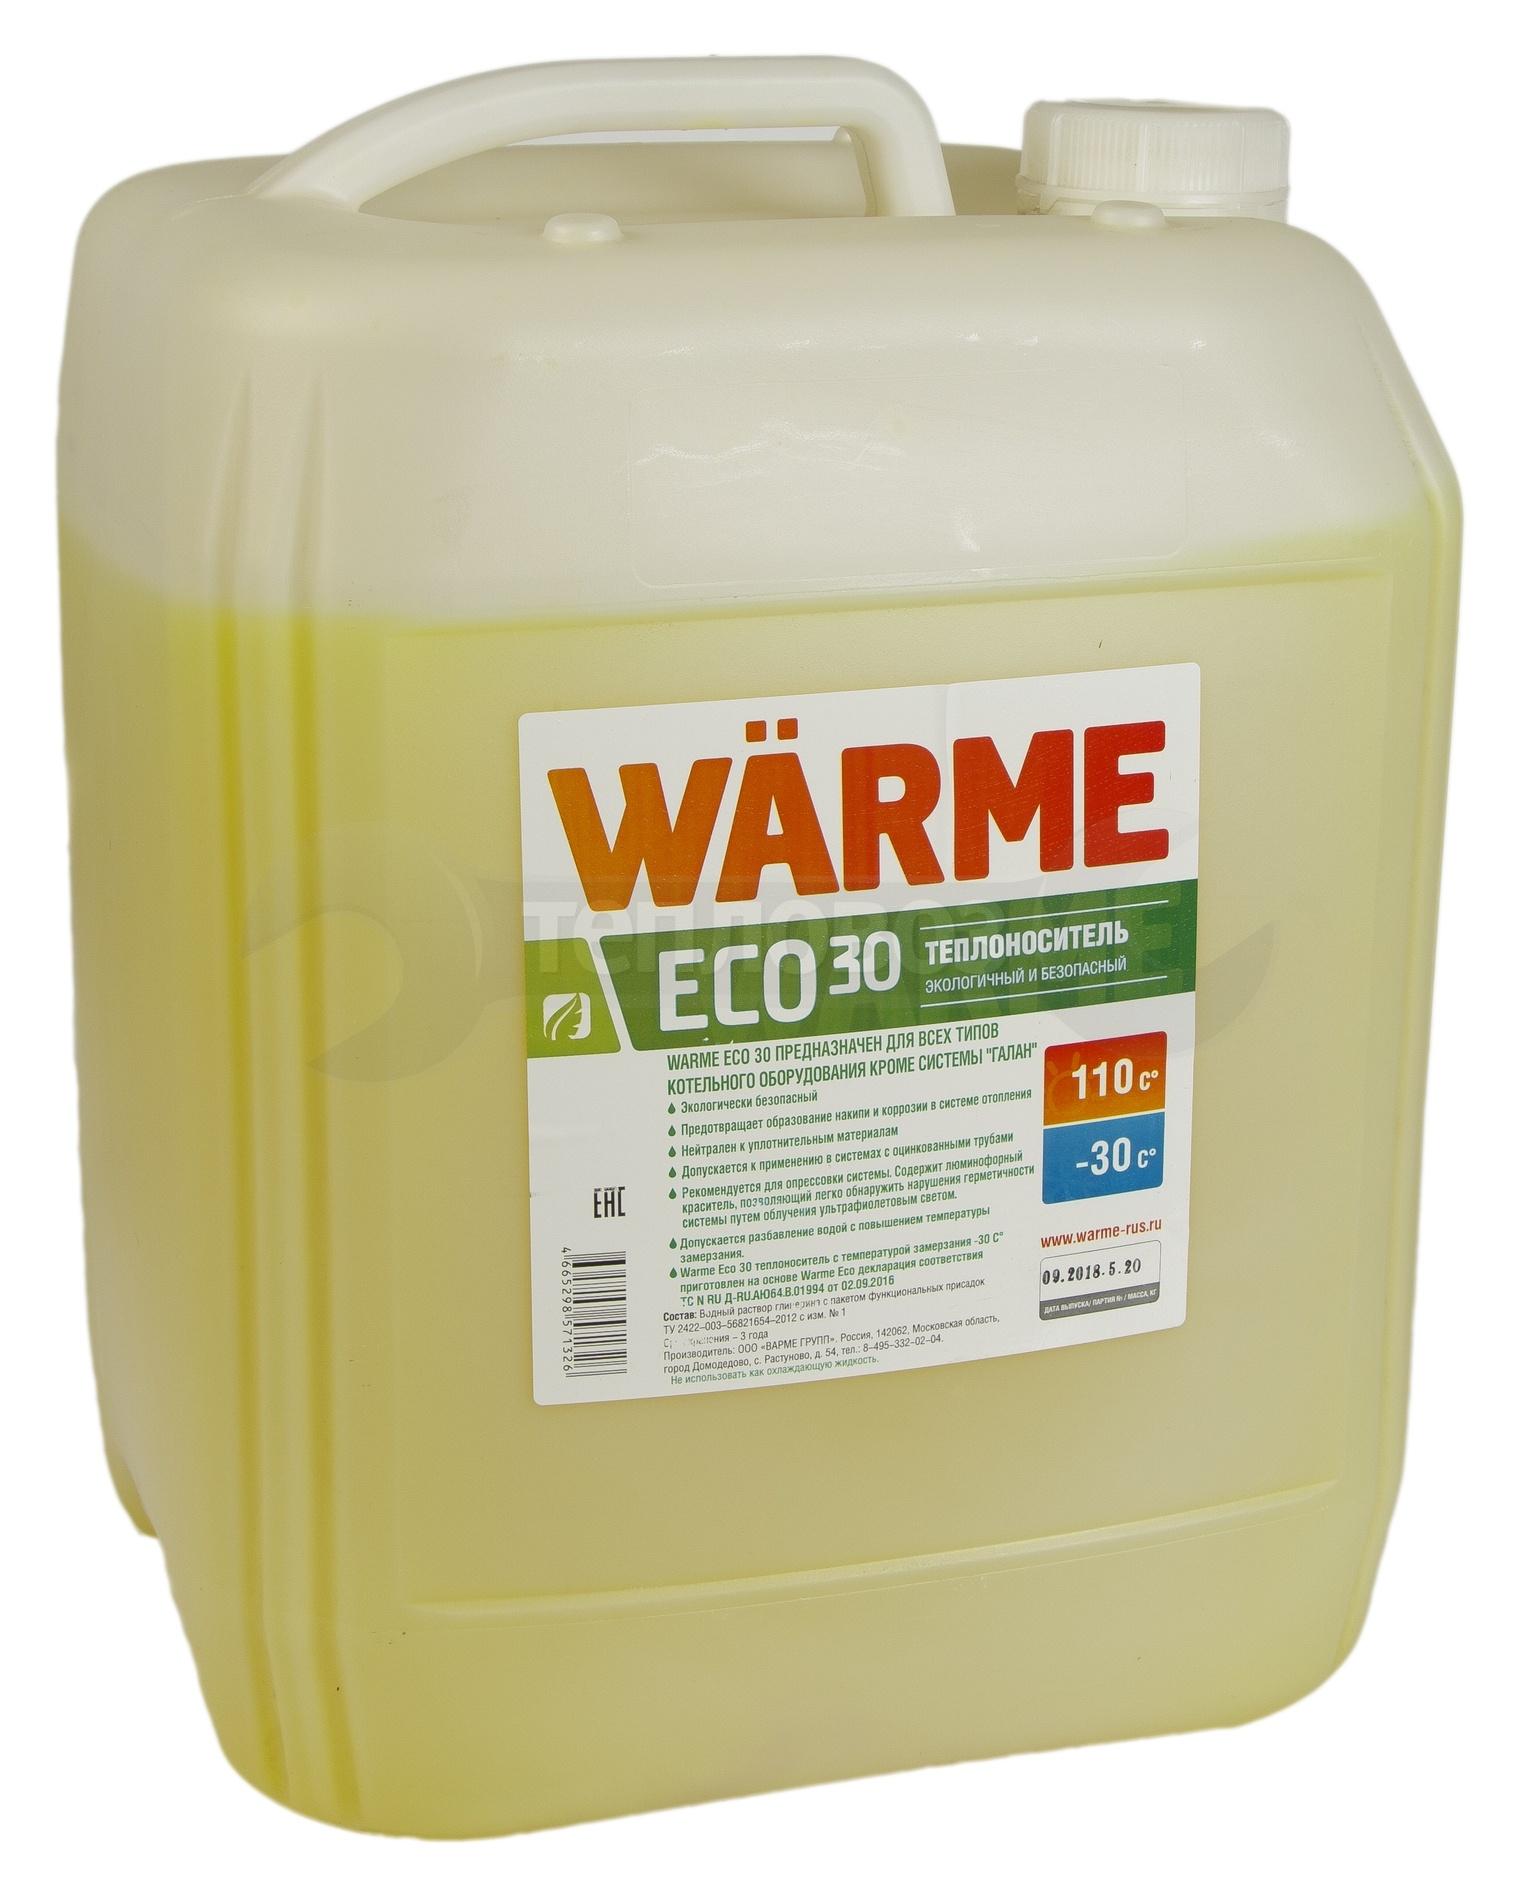 Warme ECO 30 (АВТ- ЭКО-30), 20 кг